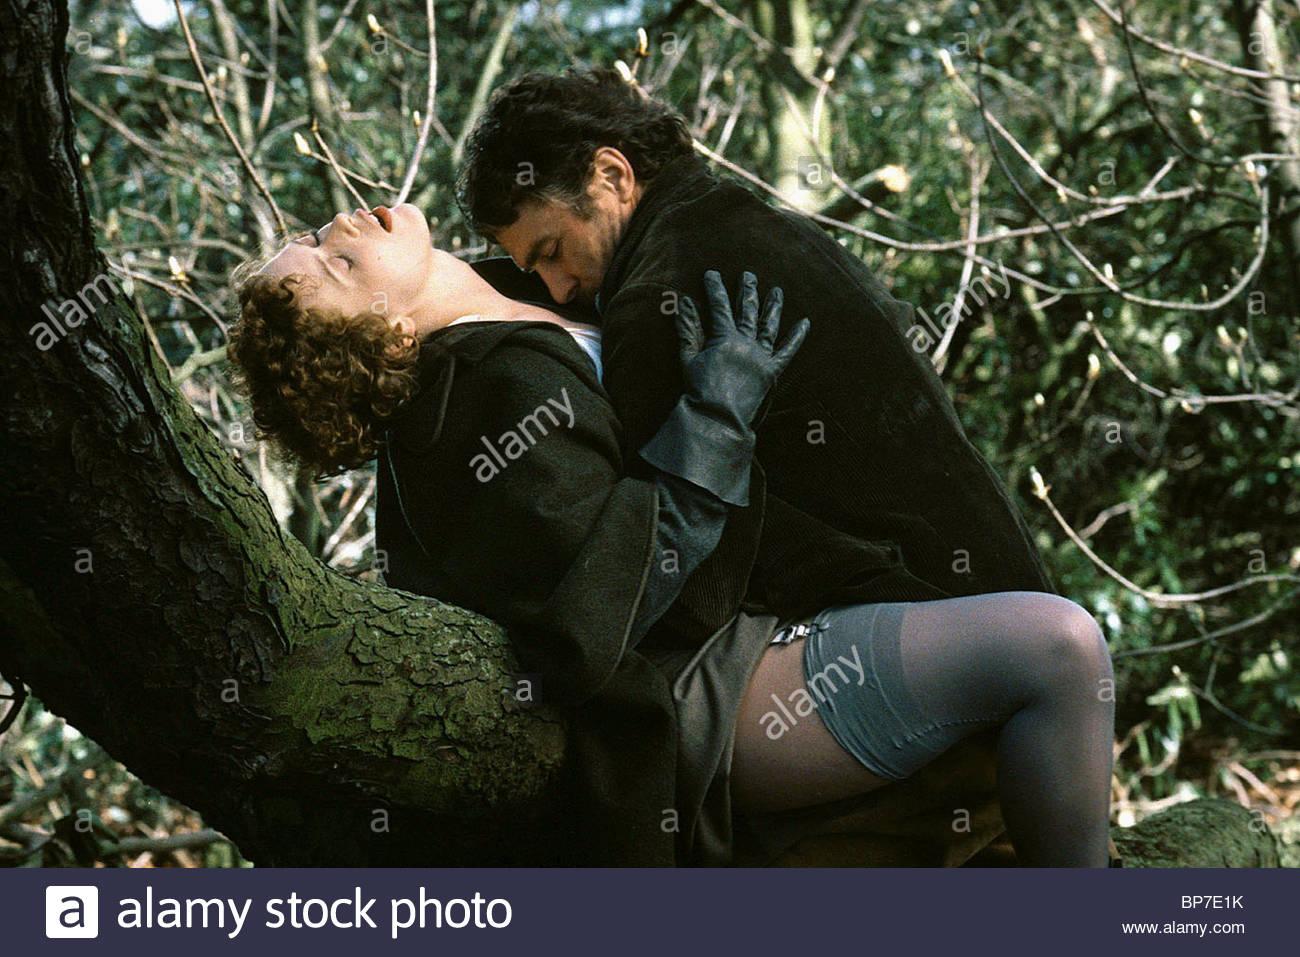 lady chatterleys älskare film